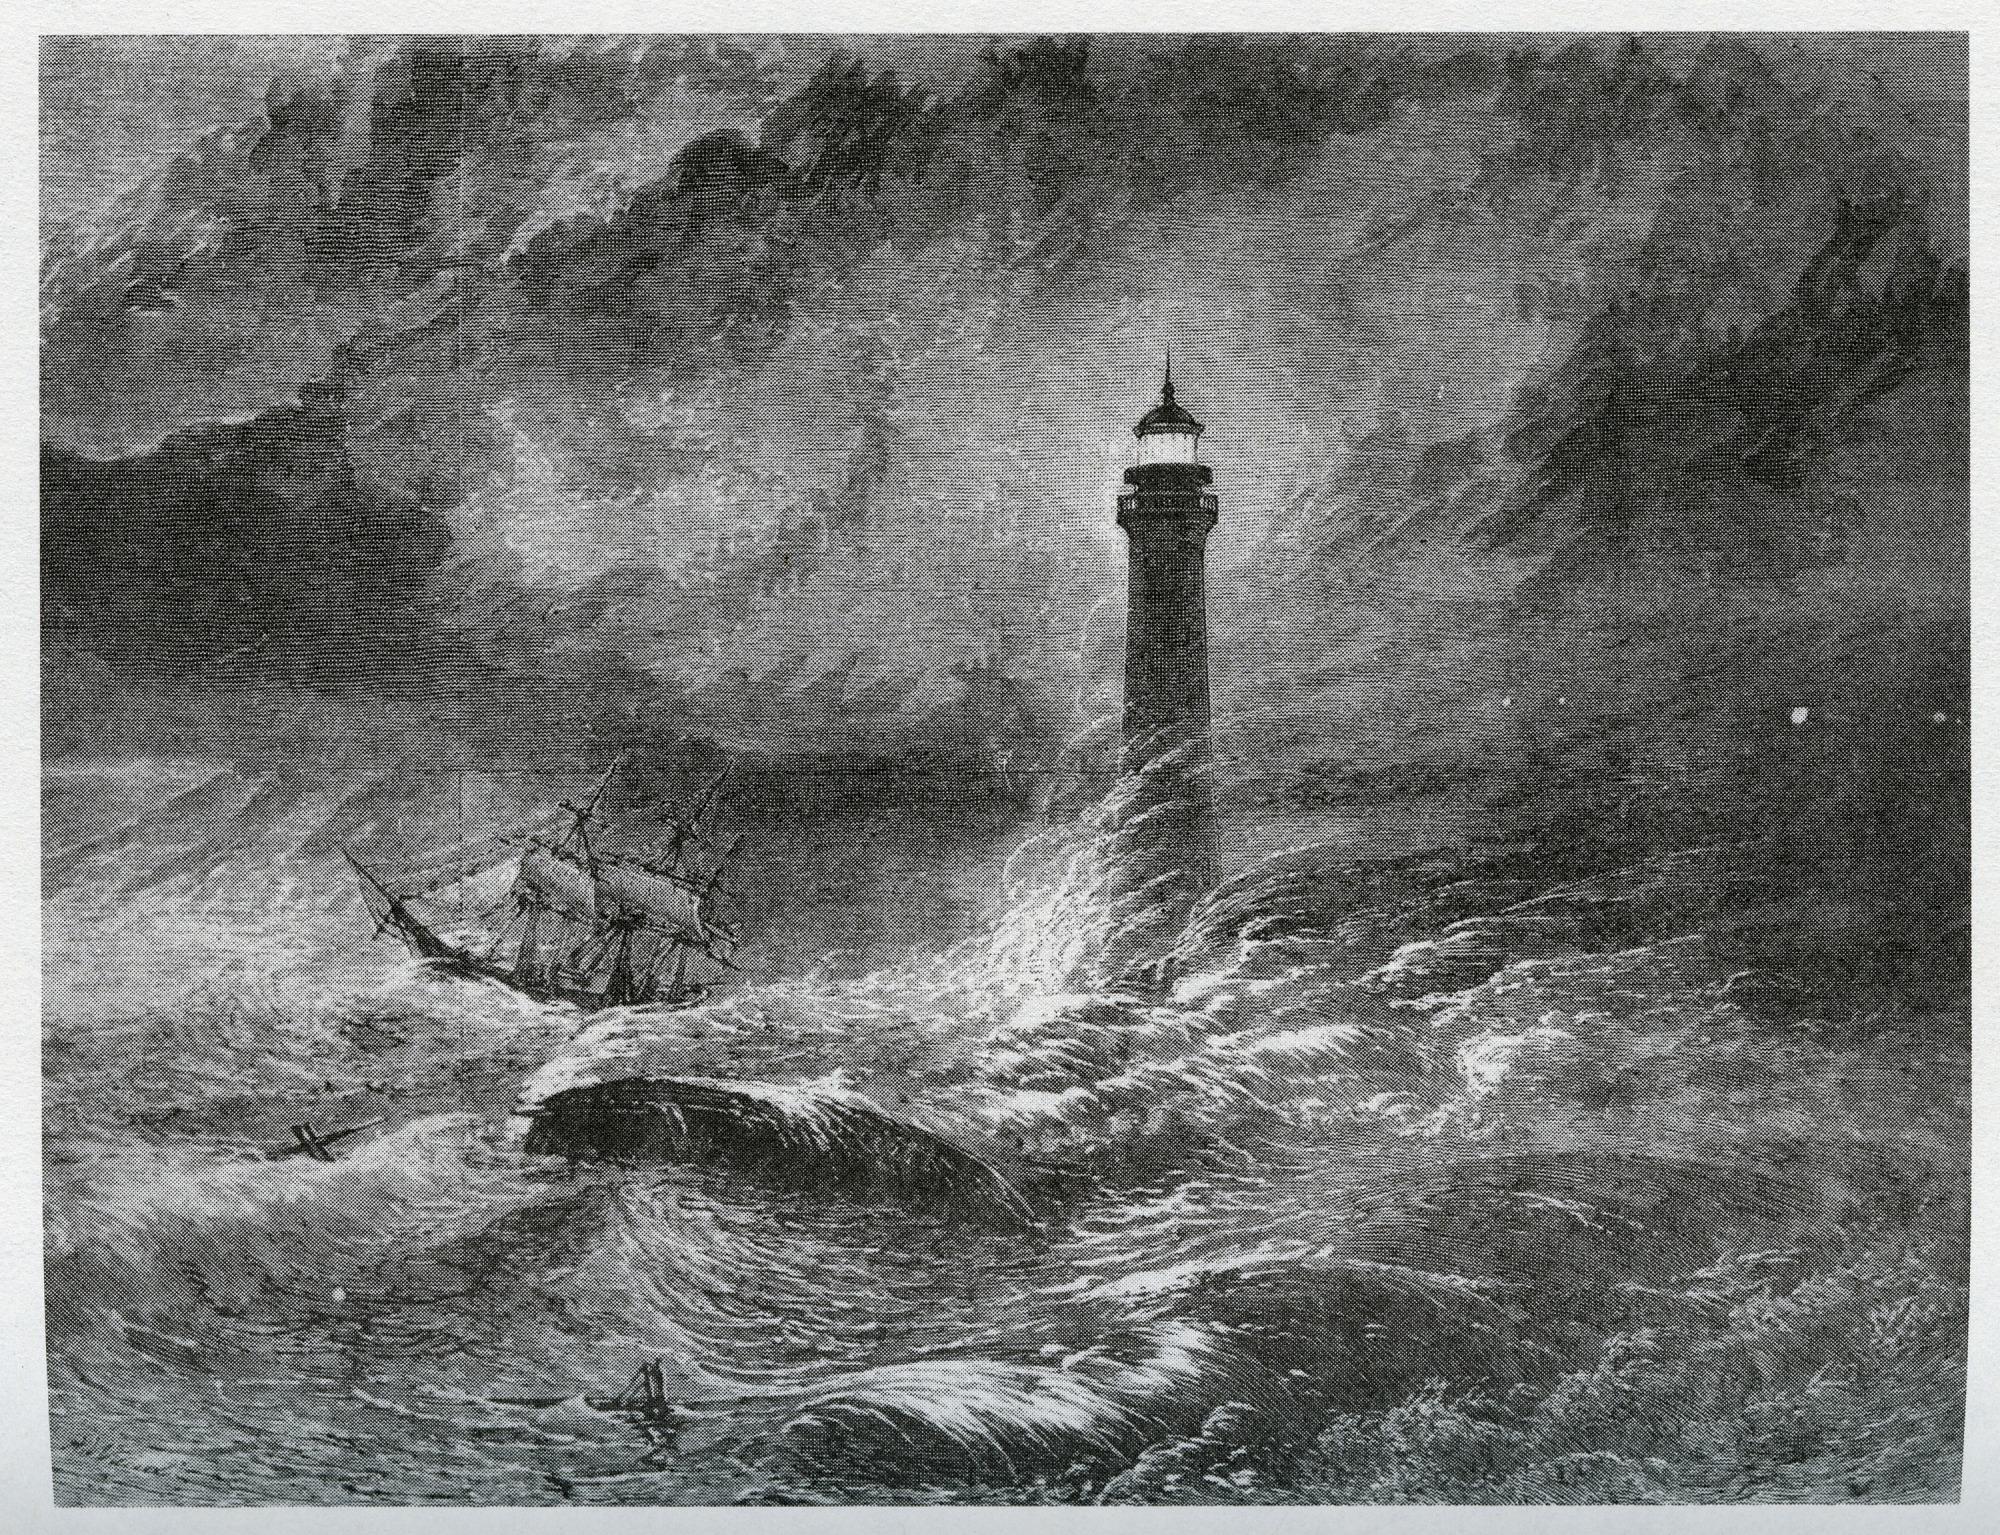 Minot's Ledge Lighthouse